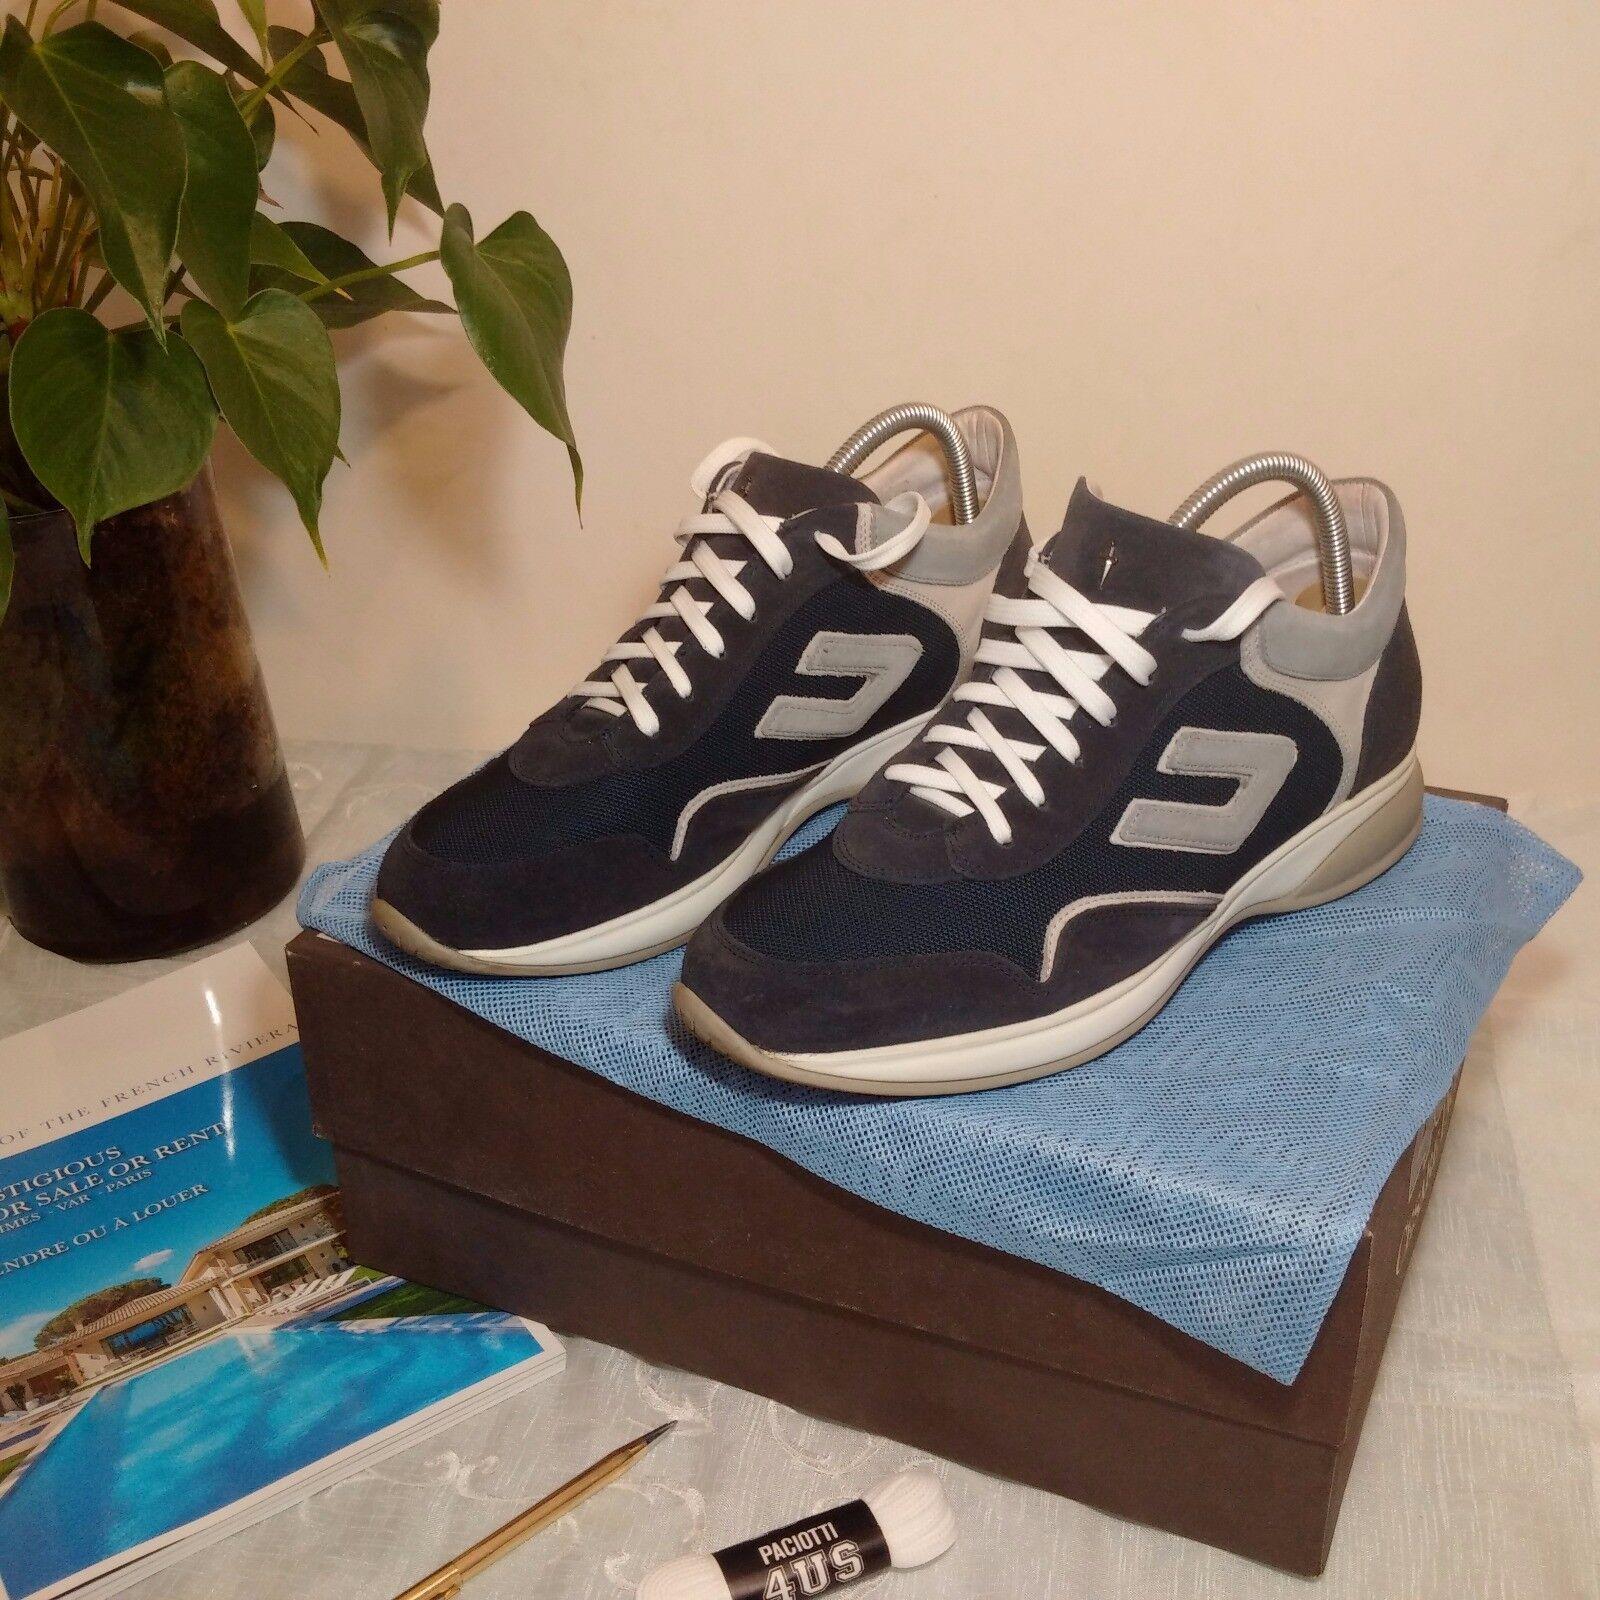 Zapatos/ Zapatos Cesare Paciotti Sport H, H, H, 40.5 (- 15 %) 1aa6fb